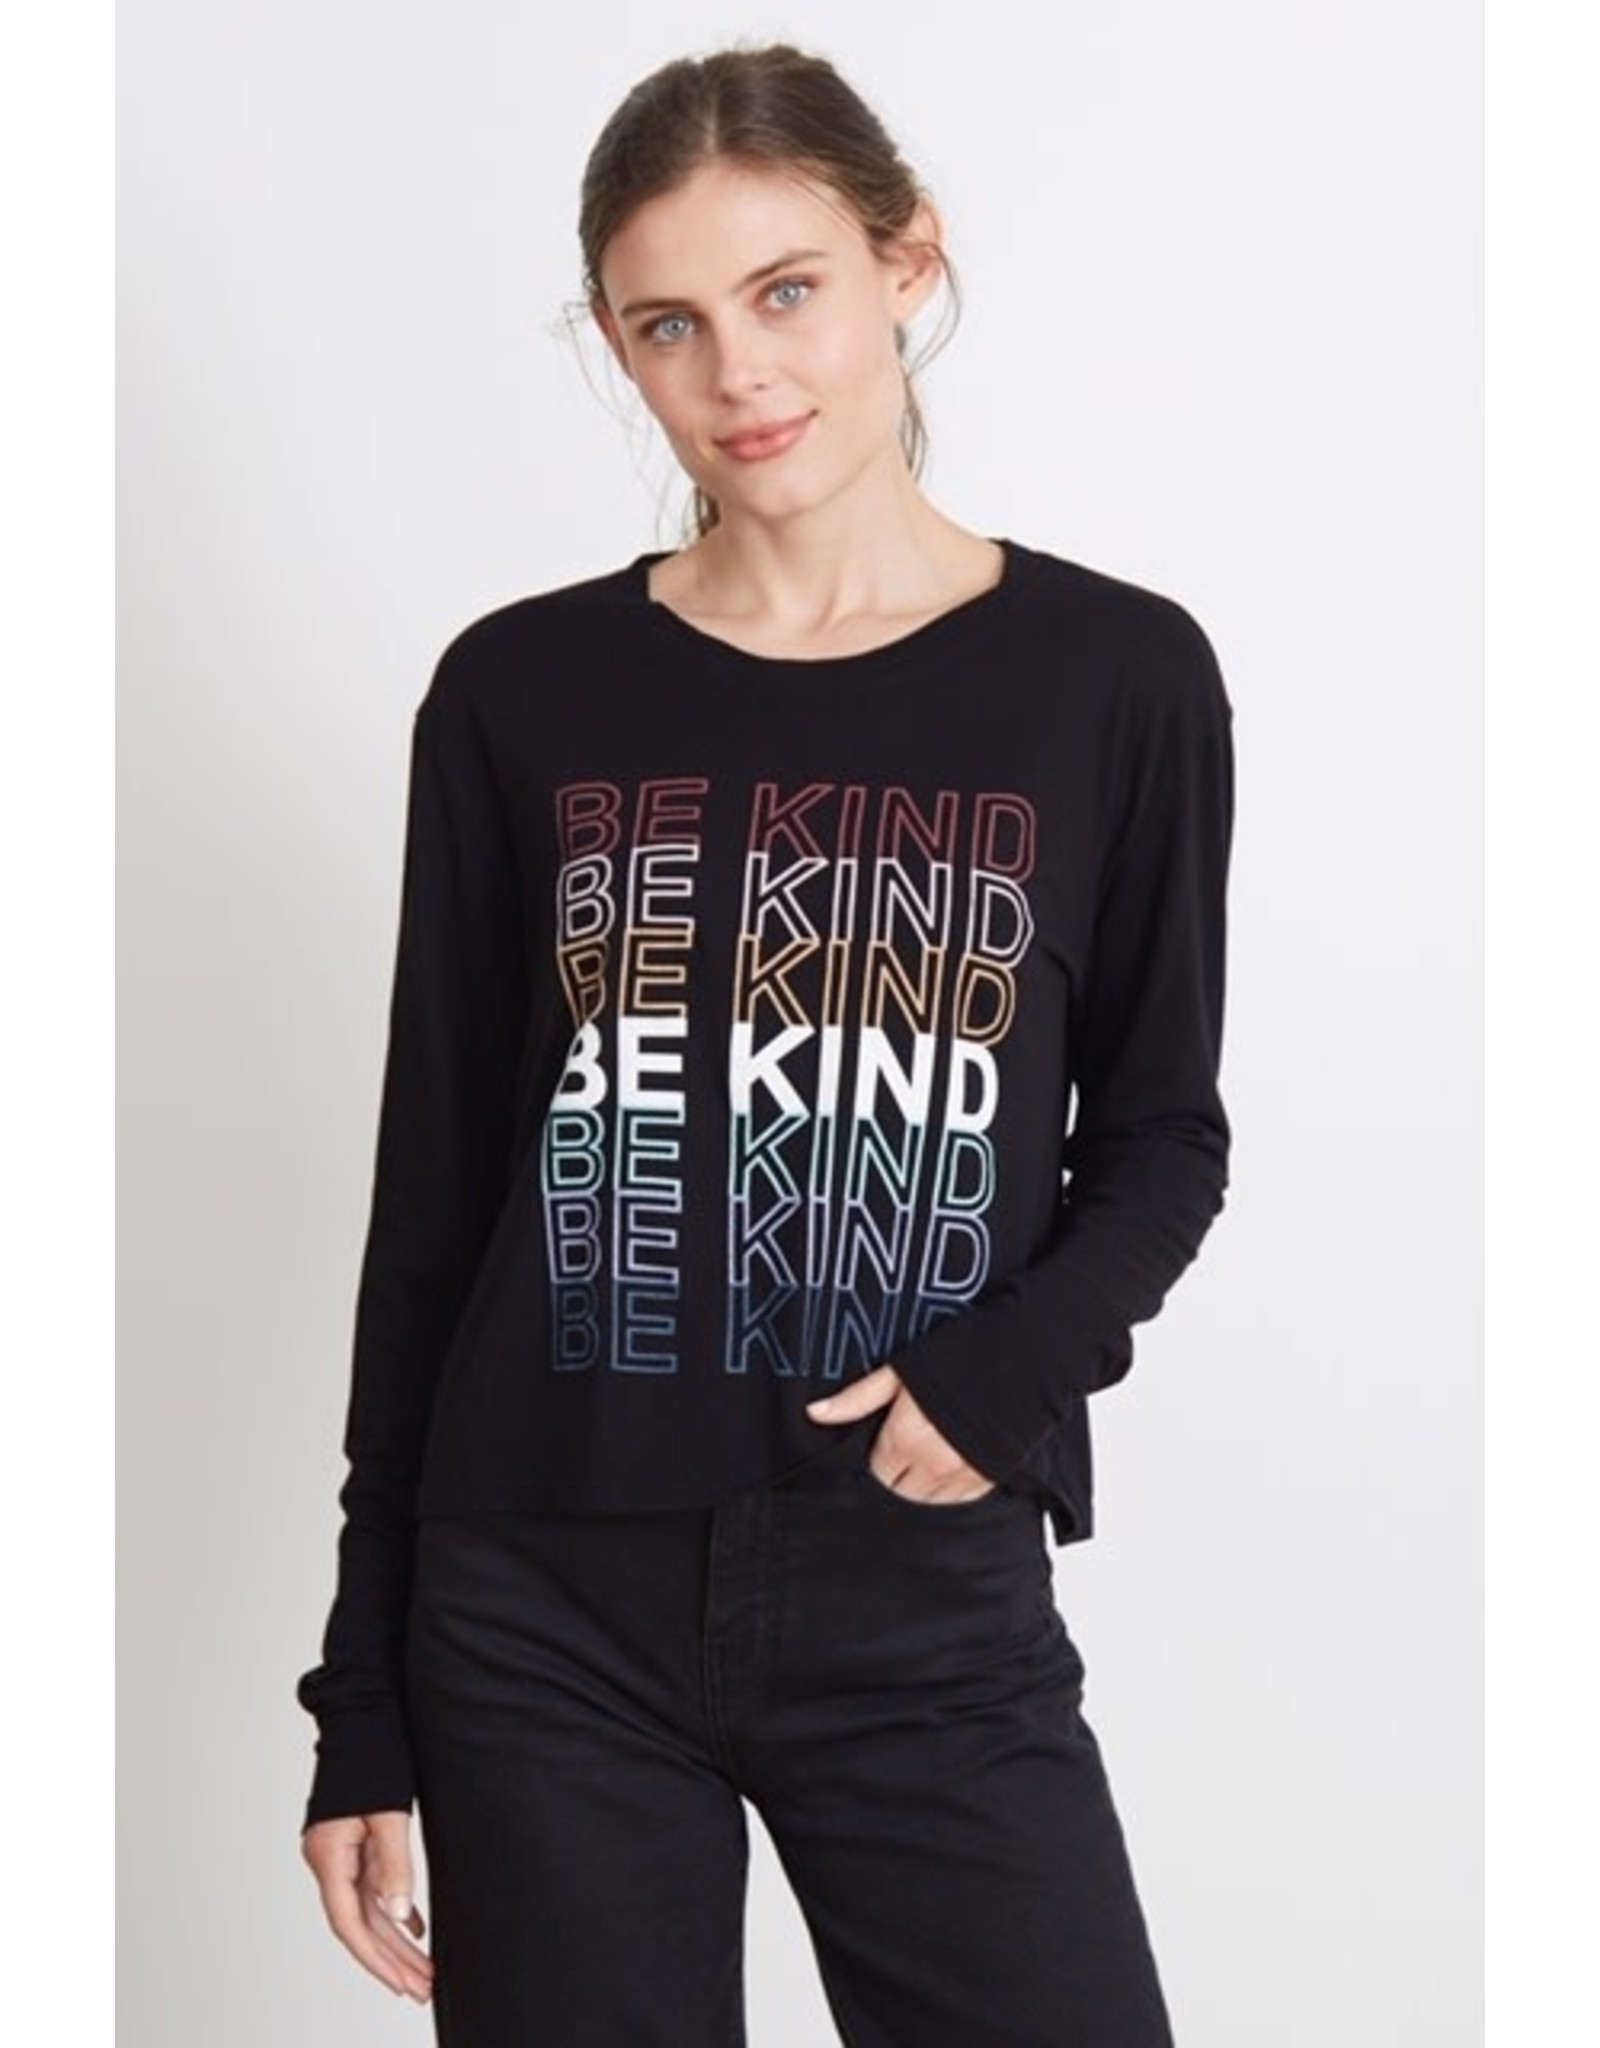 good hYOUman good hYOUman - Phoebe long sleeve tee - Be Kind Repeat